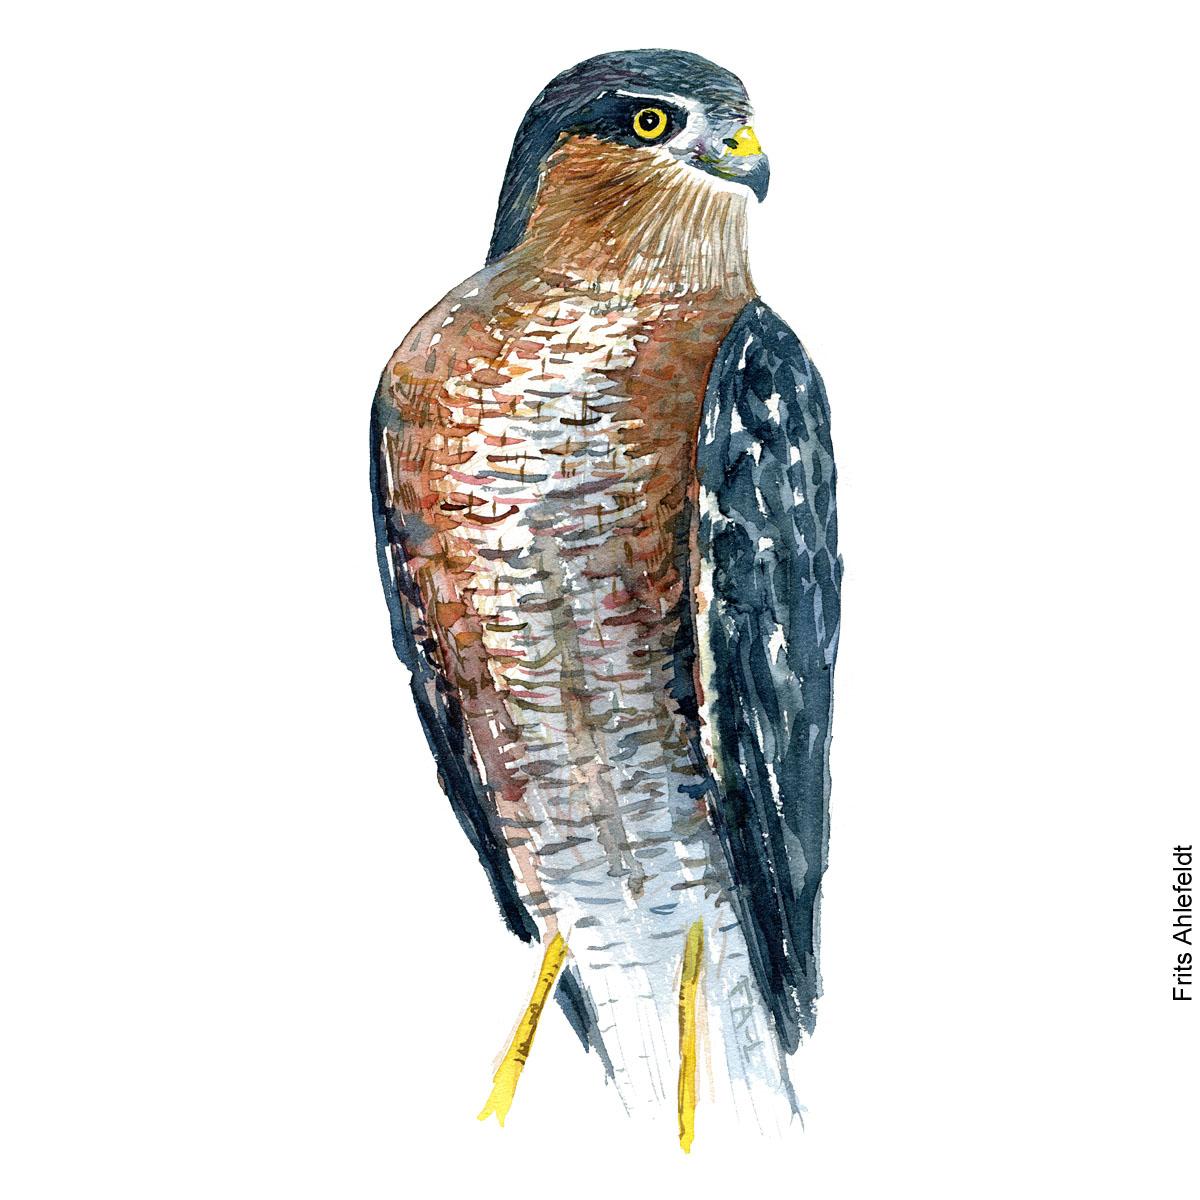 Spurvehoeg - Eurasian sparrowhawk bird watercolor painting. Artwork by Frits Ahlefeldt. Fugle akvarel